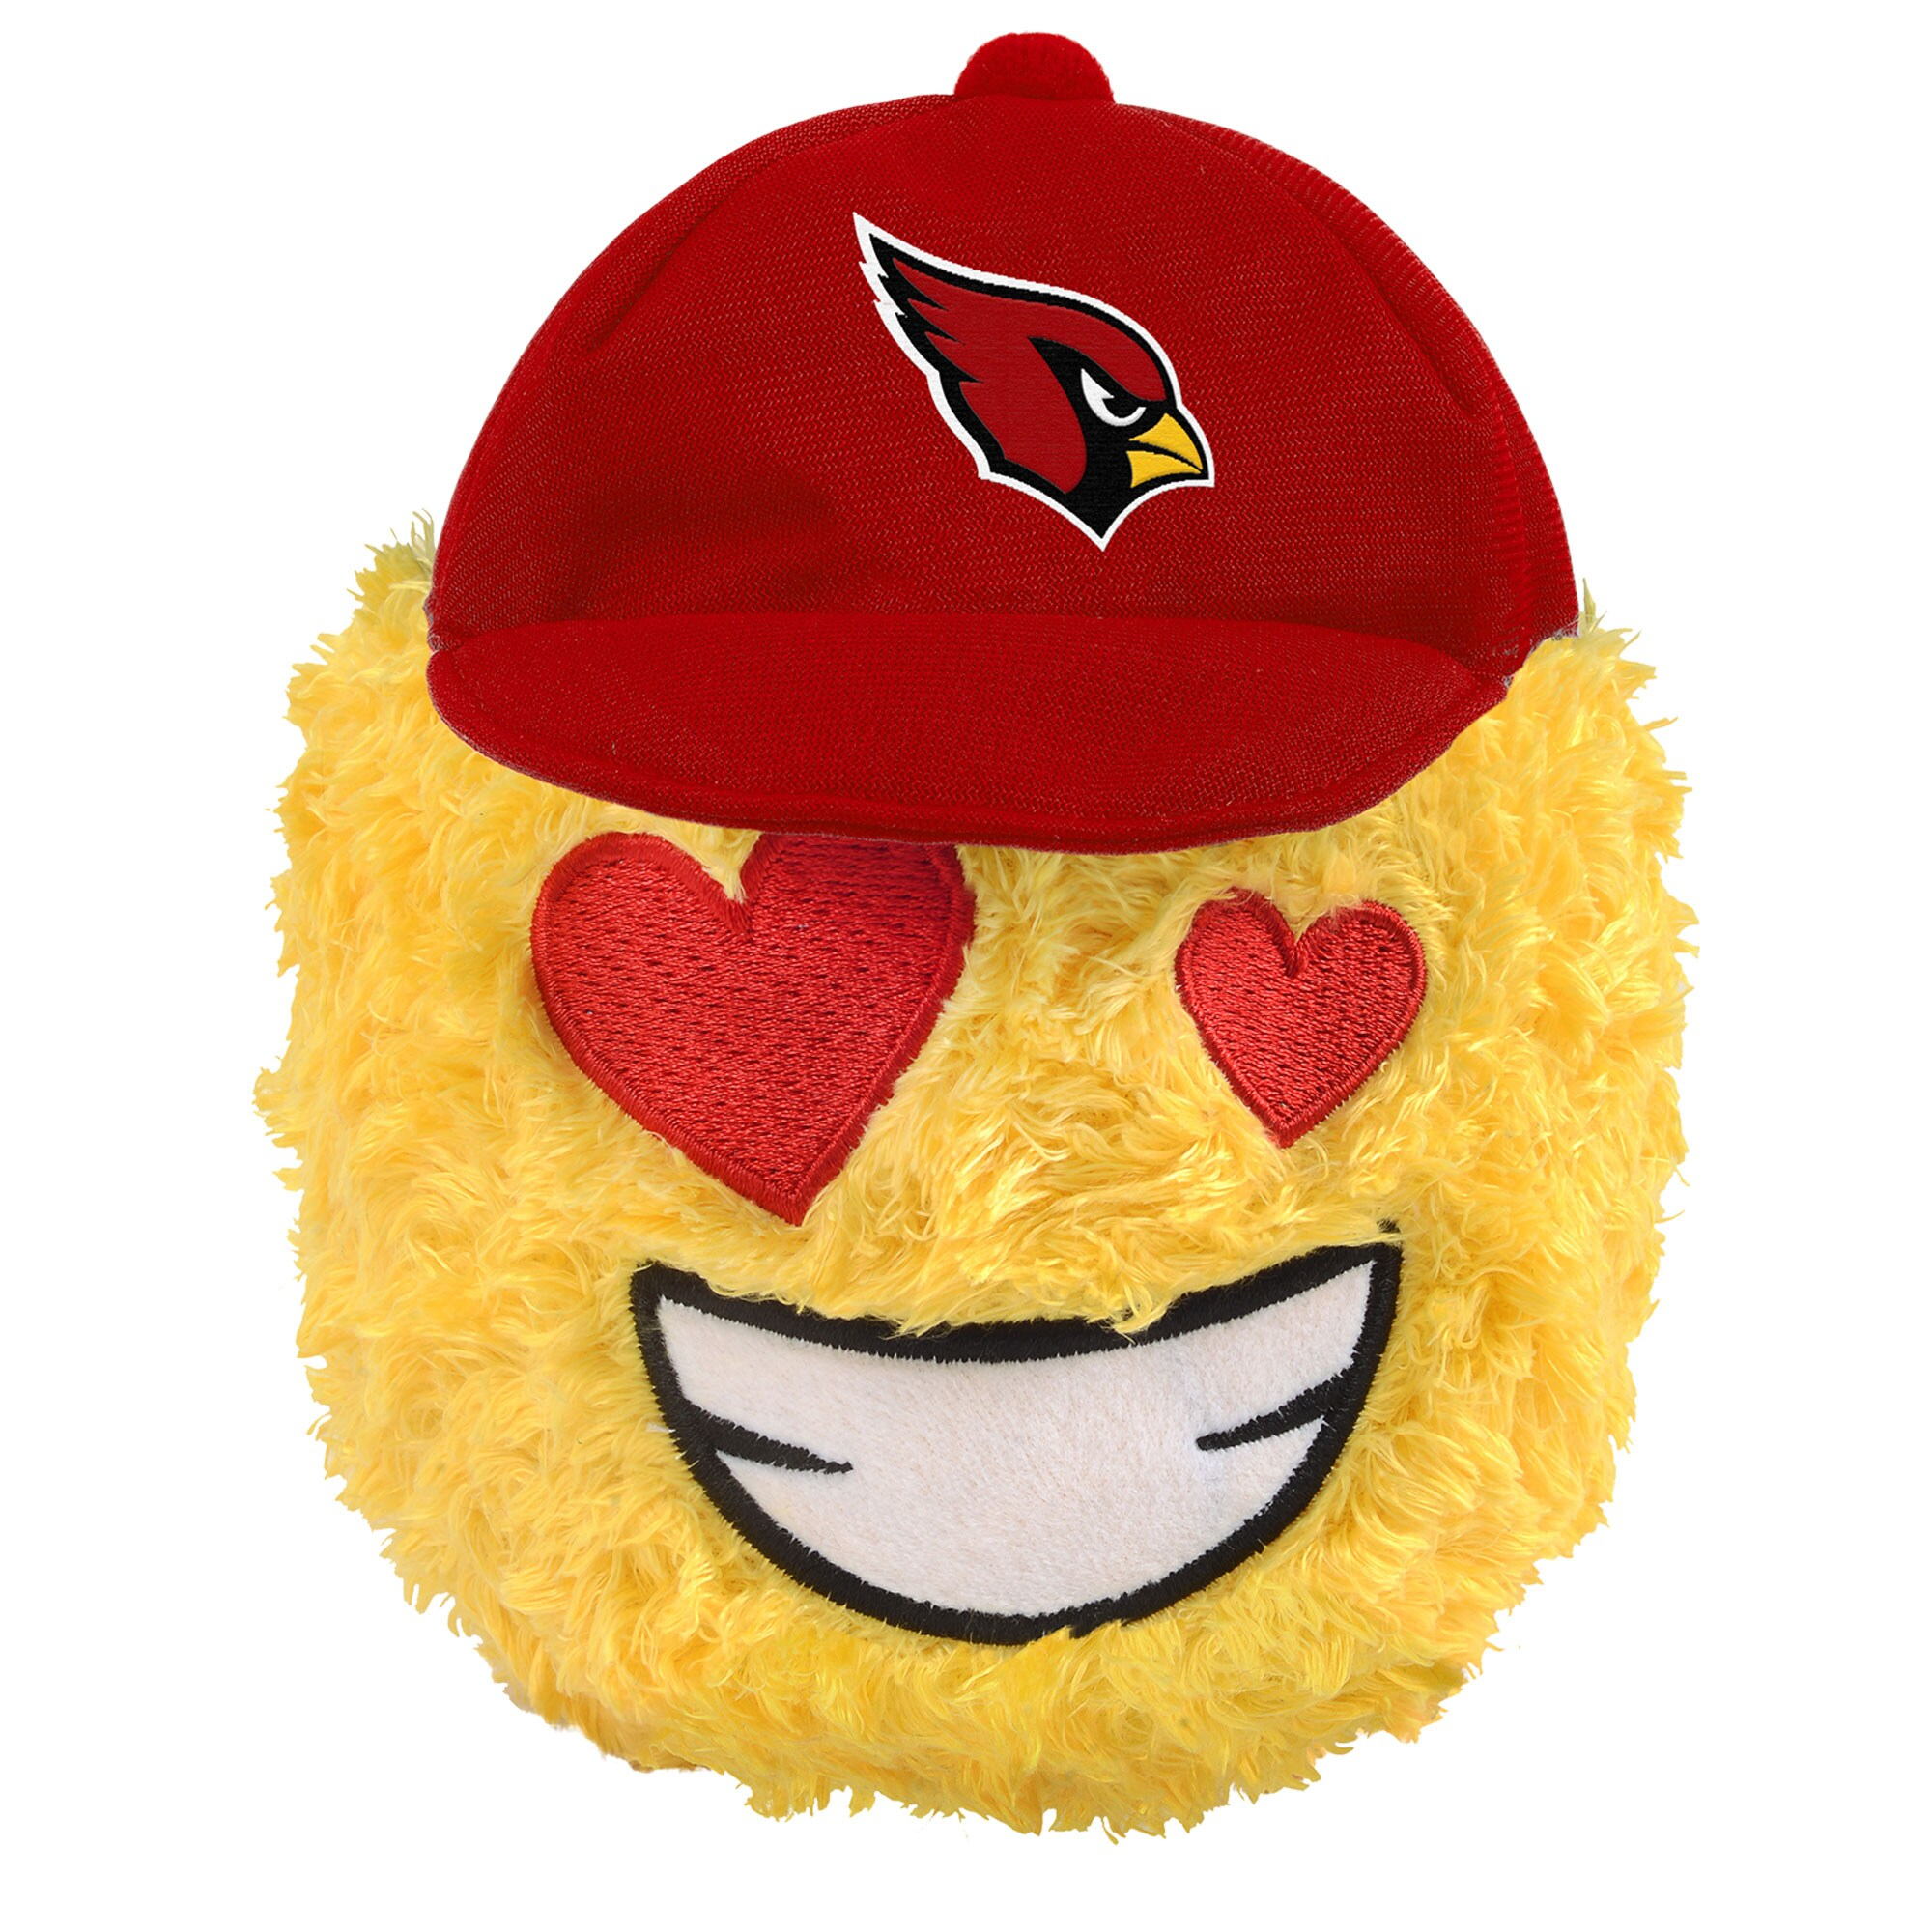 "Arizona Cardinals 5"" Heart Eyes Teamoji Plush Toy"